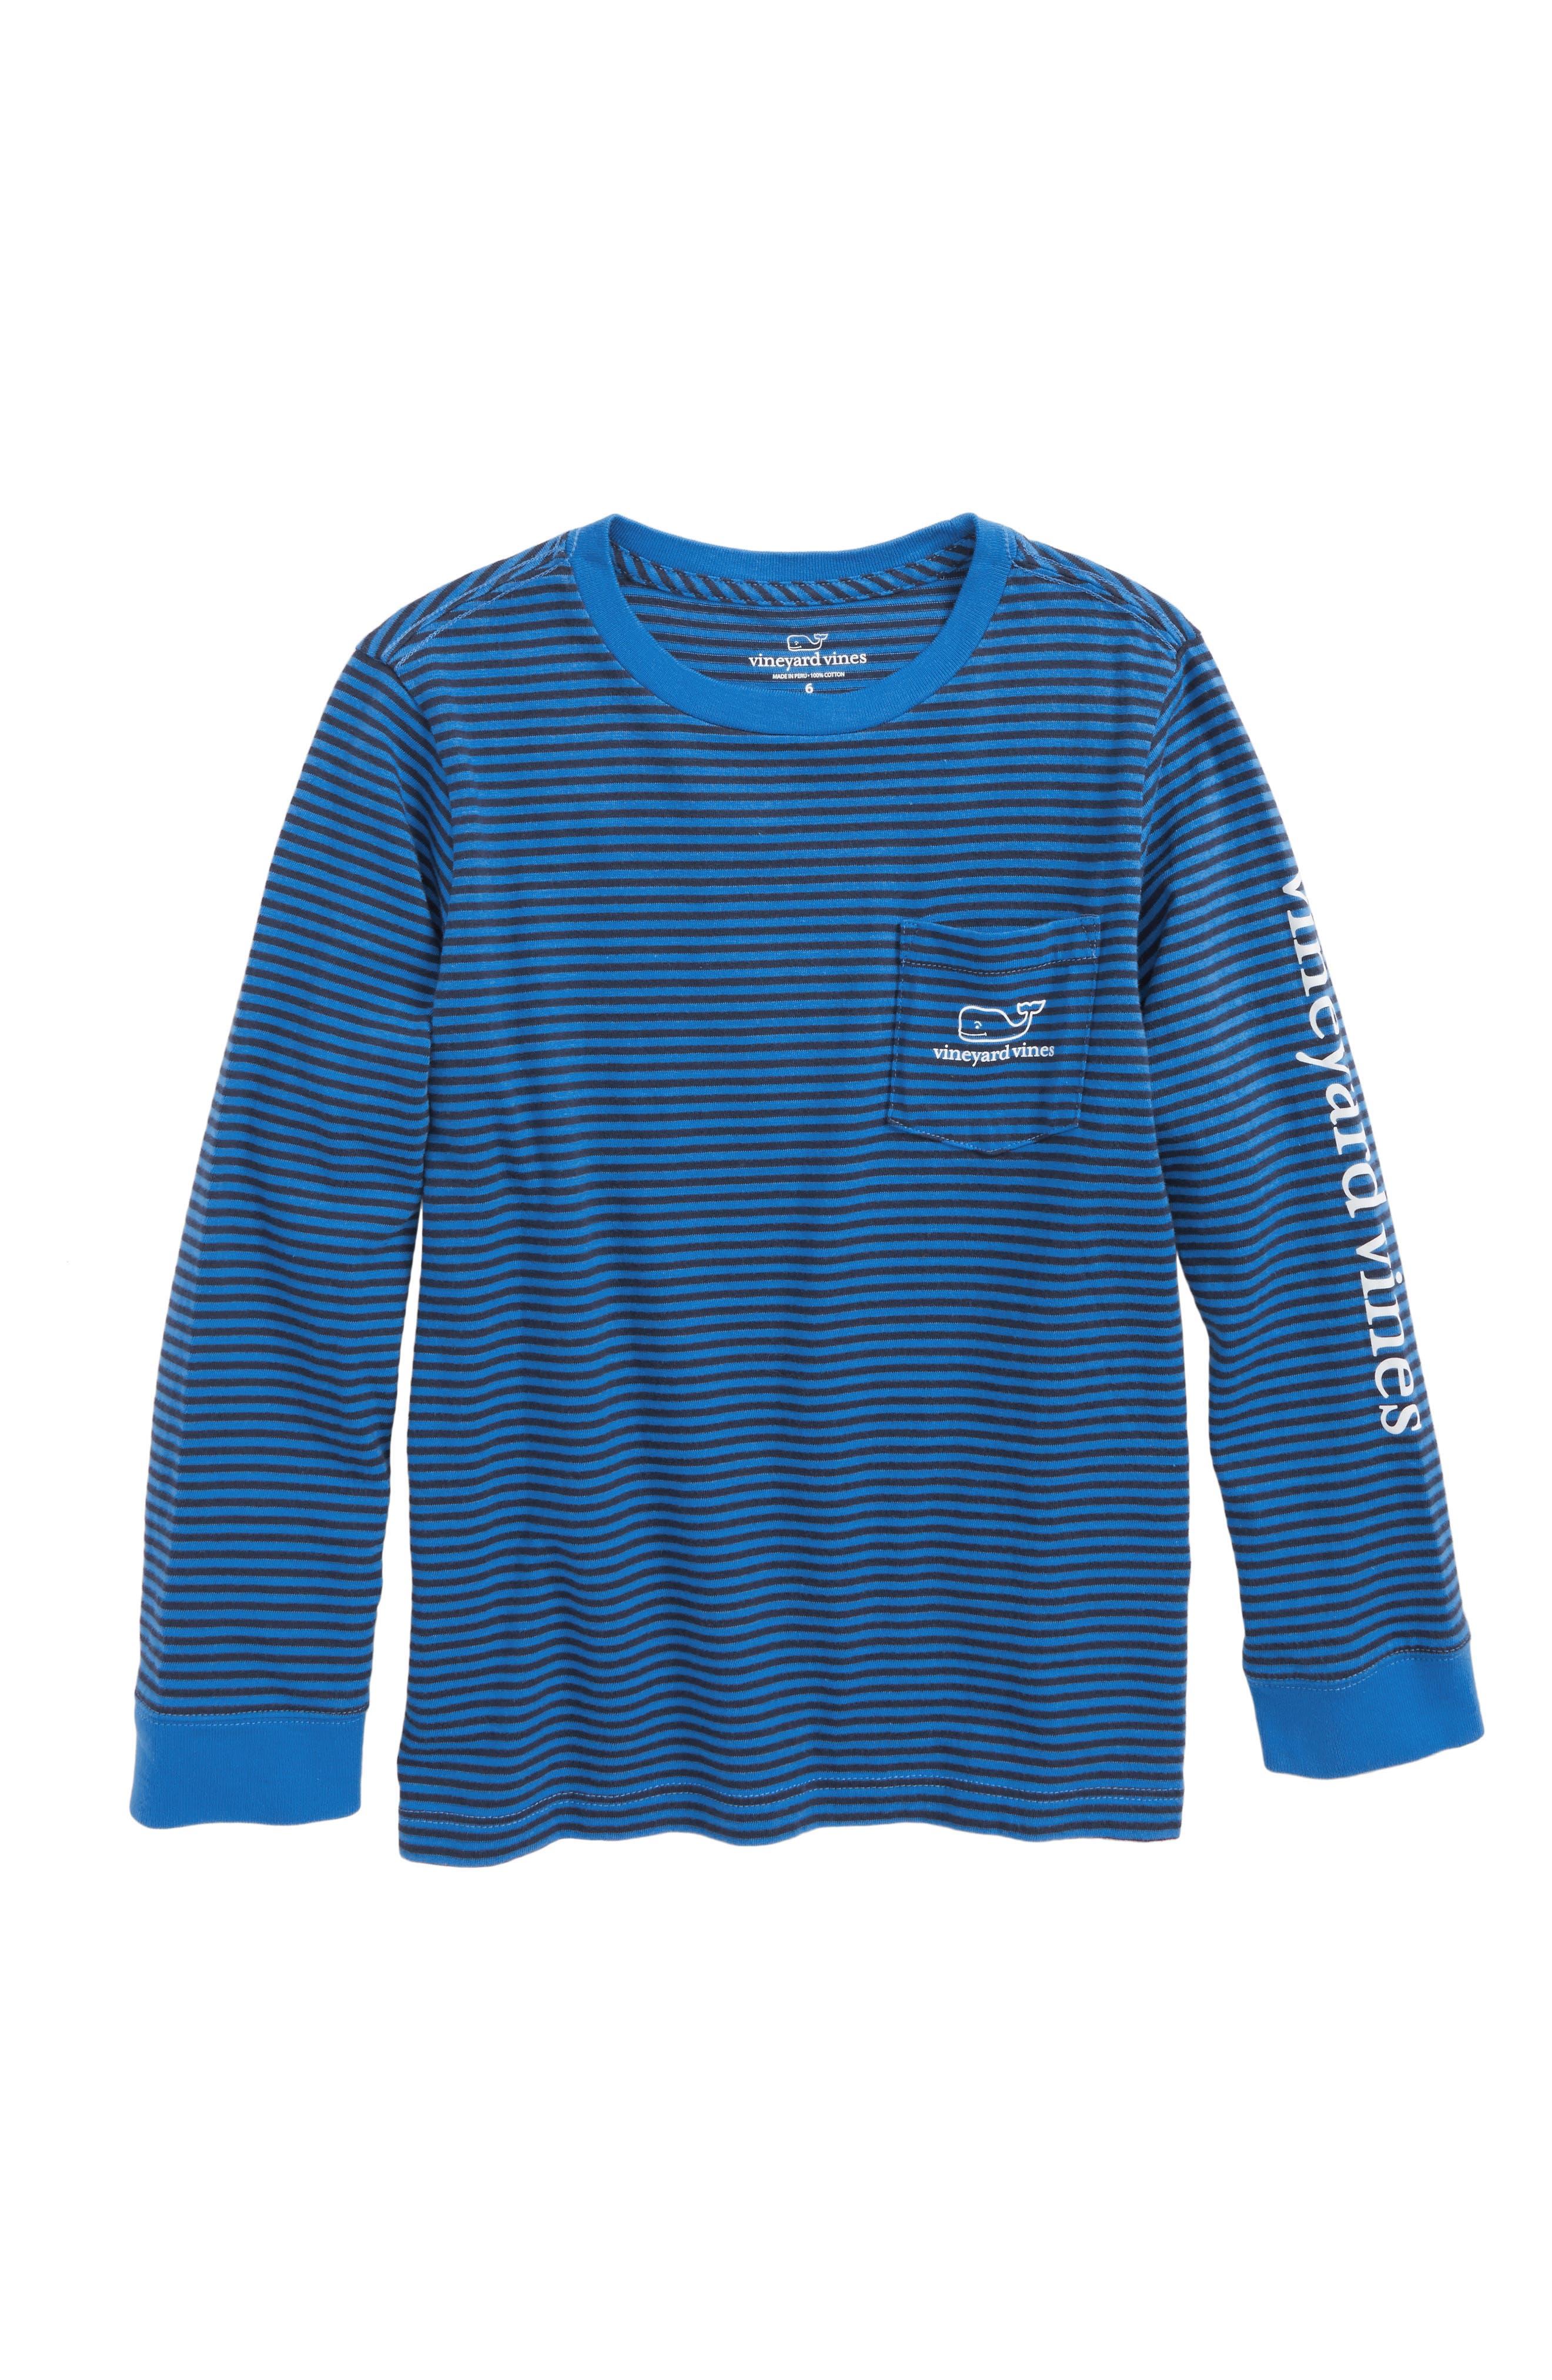 vineyard vines Stripe Vintage Whale Pocket T-Shirt (Toddler Boys & Little Boys)